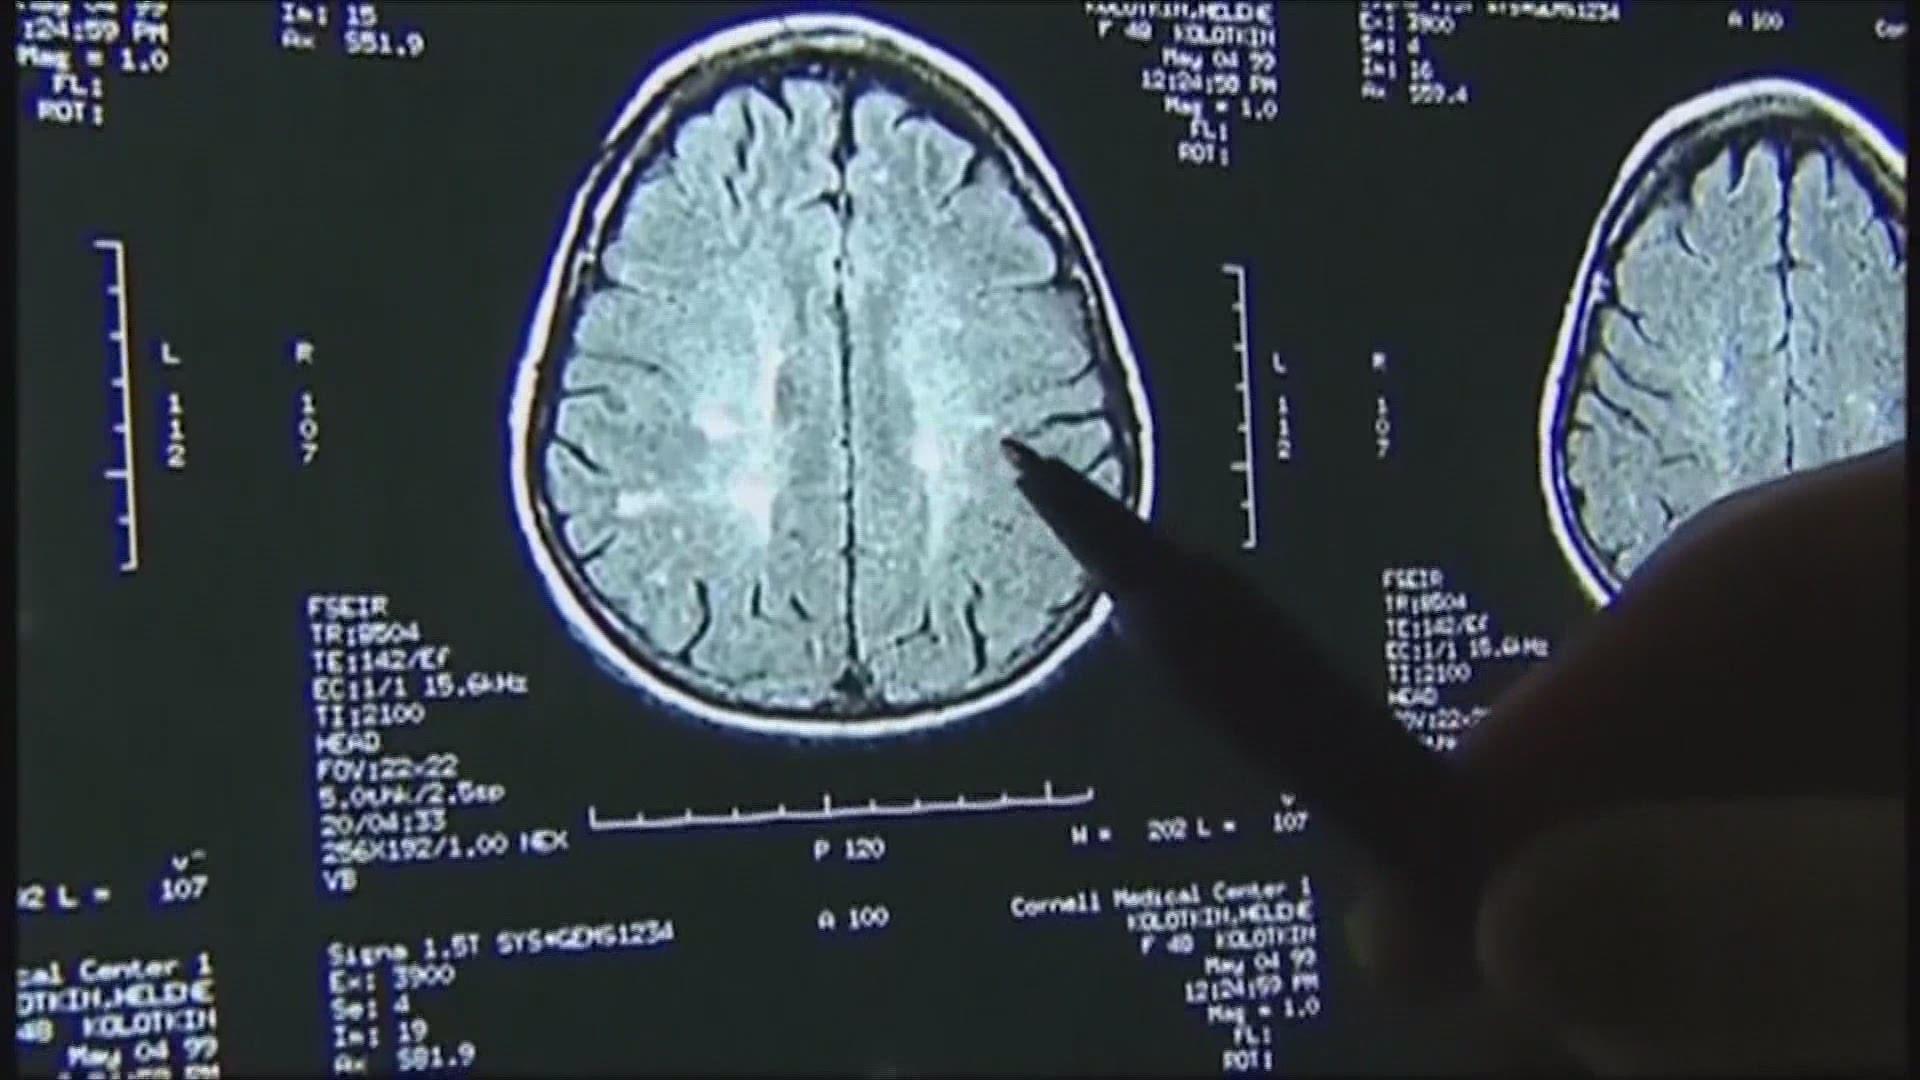 Study indicates COVID-19 causes brain damage, even in mild cases | CTV News